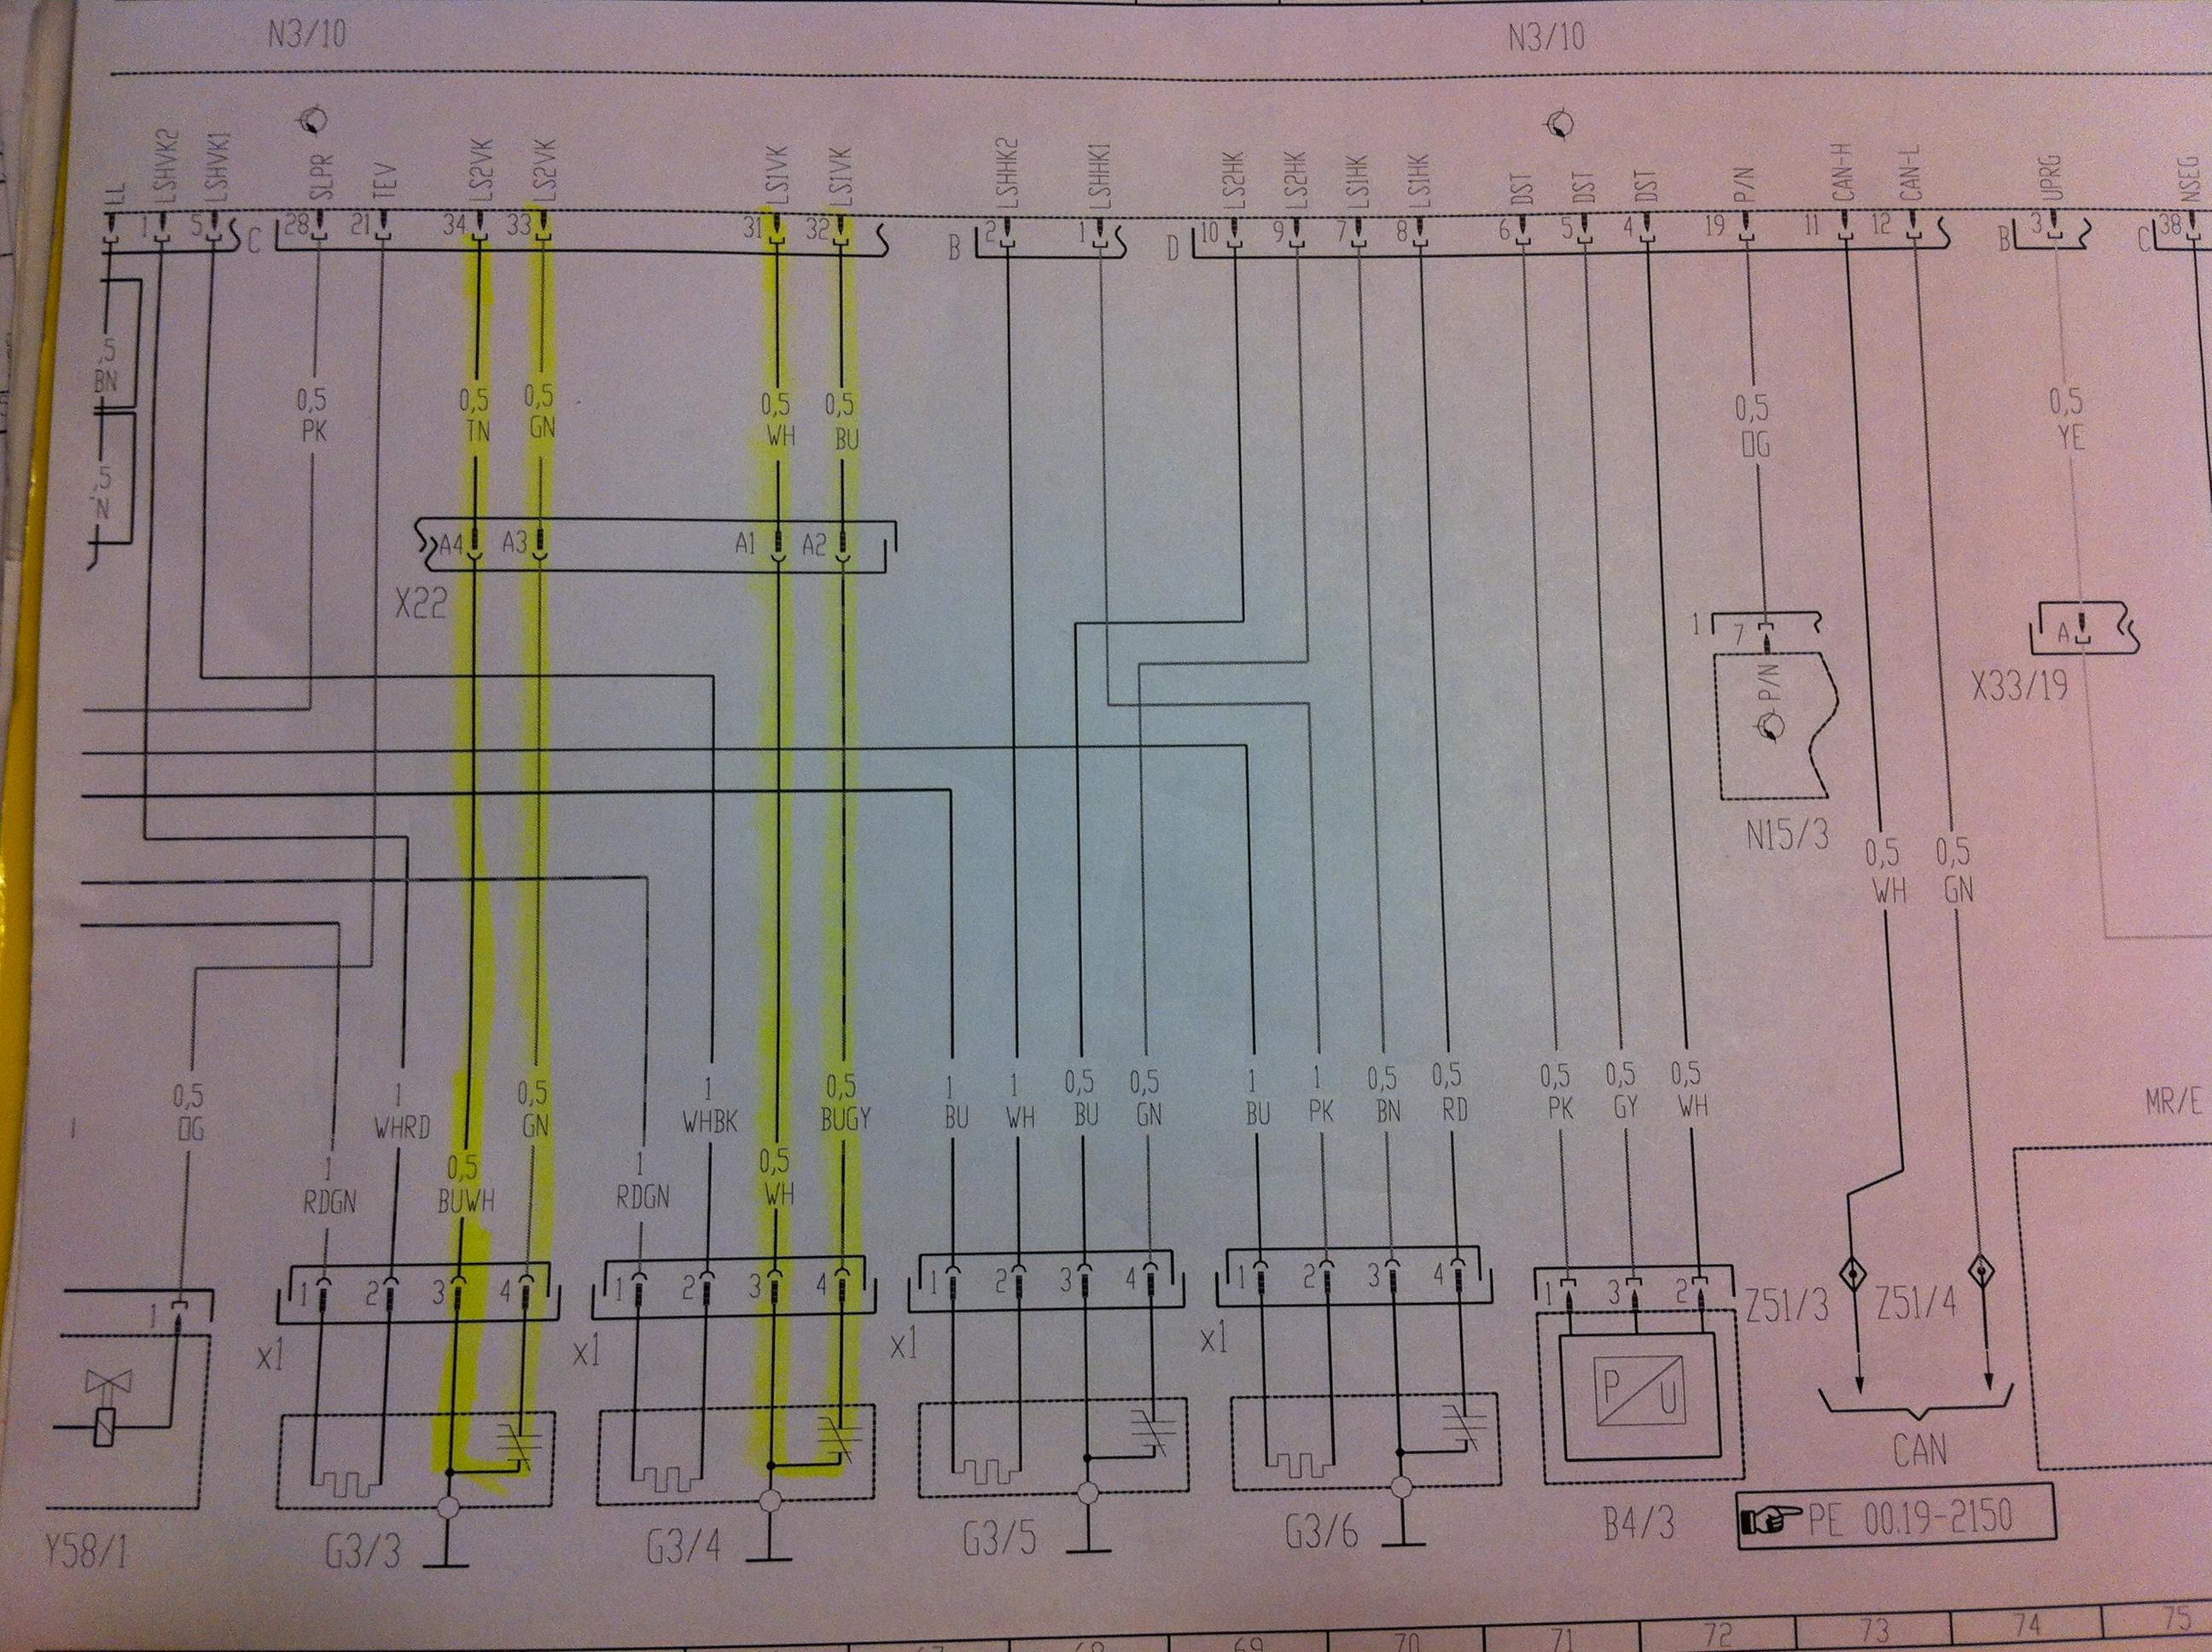 My 98 Ml320 Has Been Displaying Error Code P0410  I U0026 39 Ve Had